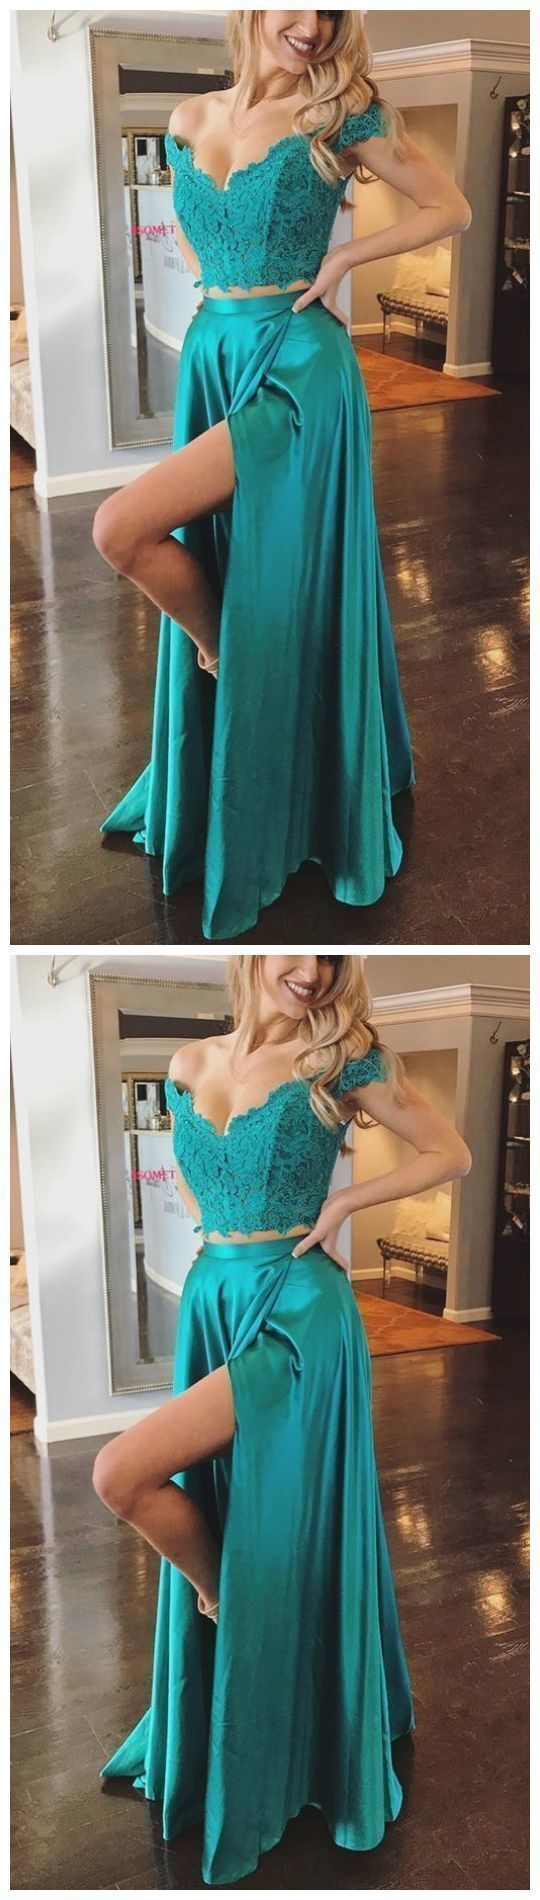 Fashion Off Shoulder Lace Prom Dress, Split Slit Evening Party Dress